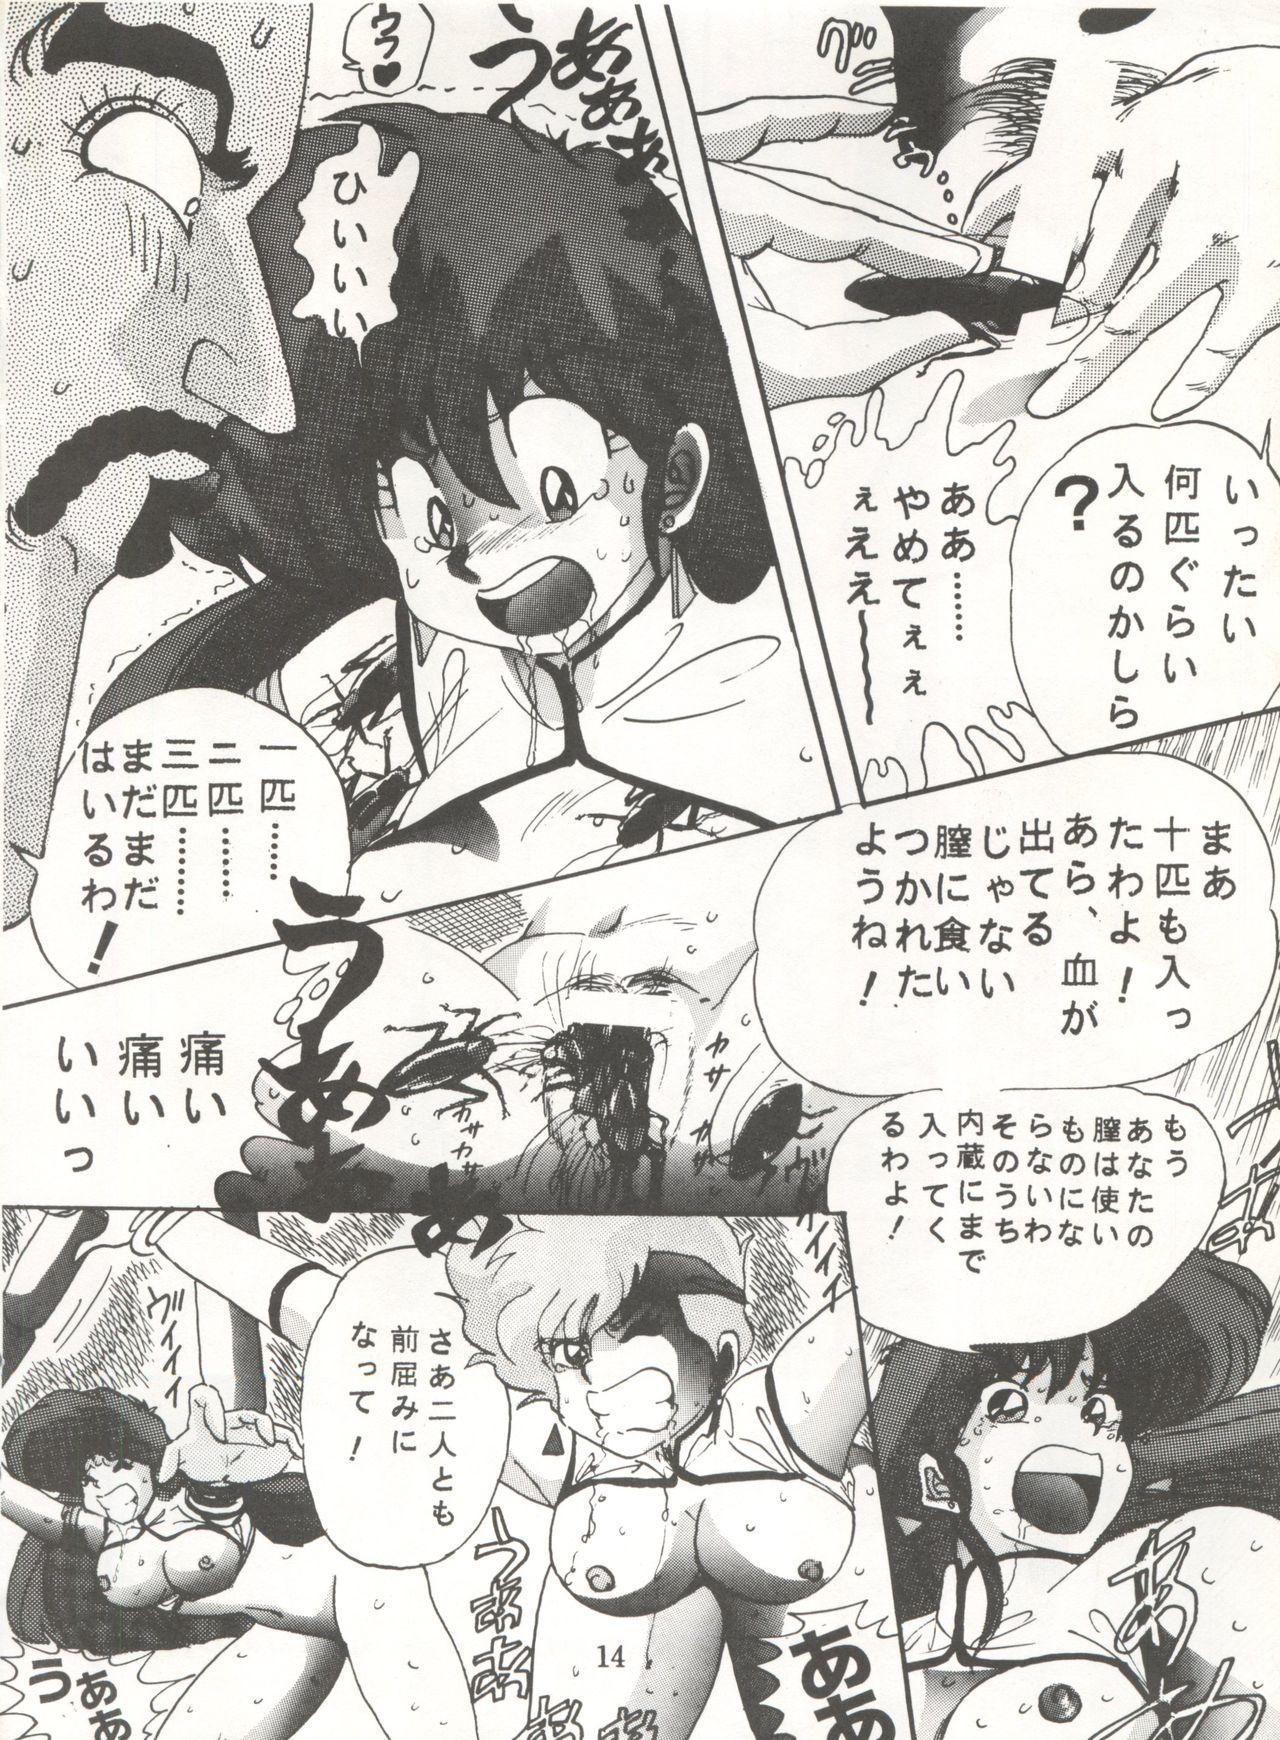 [Global One (MARO)] Sadistic 5 (Cutey Honey, Devilman, Sailor Moon), [Global One (MARO)] Sadistic (Dirty Pair, Fushigi no Umi no Nadia, Sailor Moon), [Studio Ikkatsumajin] .ribbon (Hime-chan's Ribbon) 73